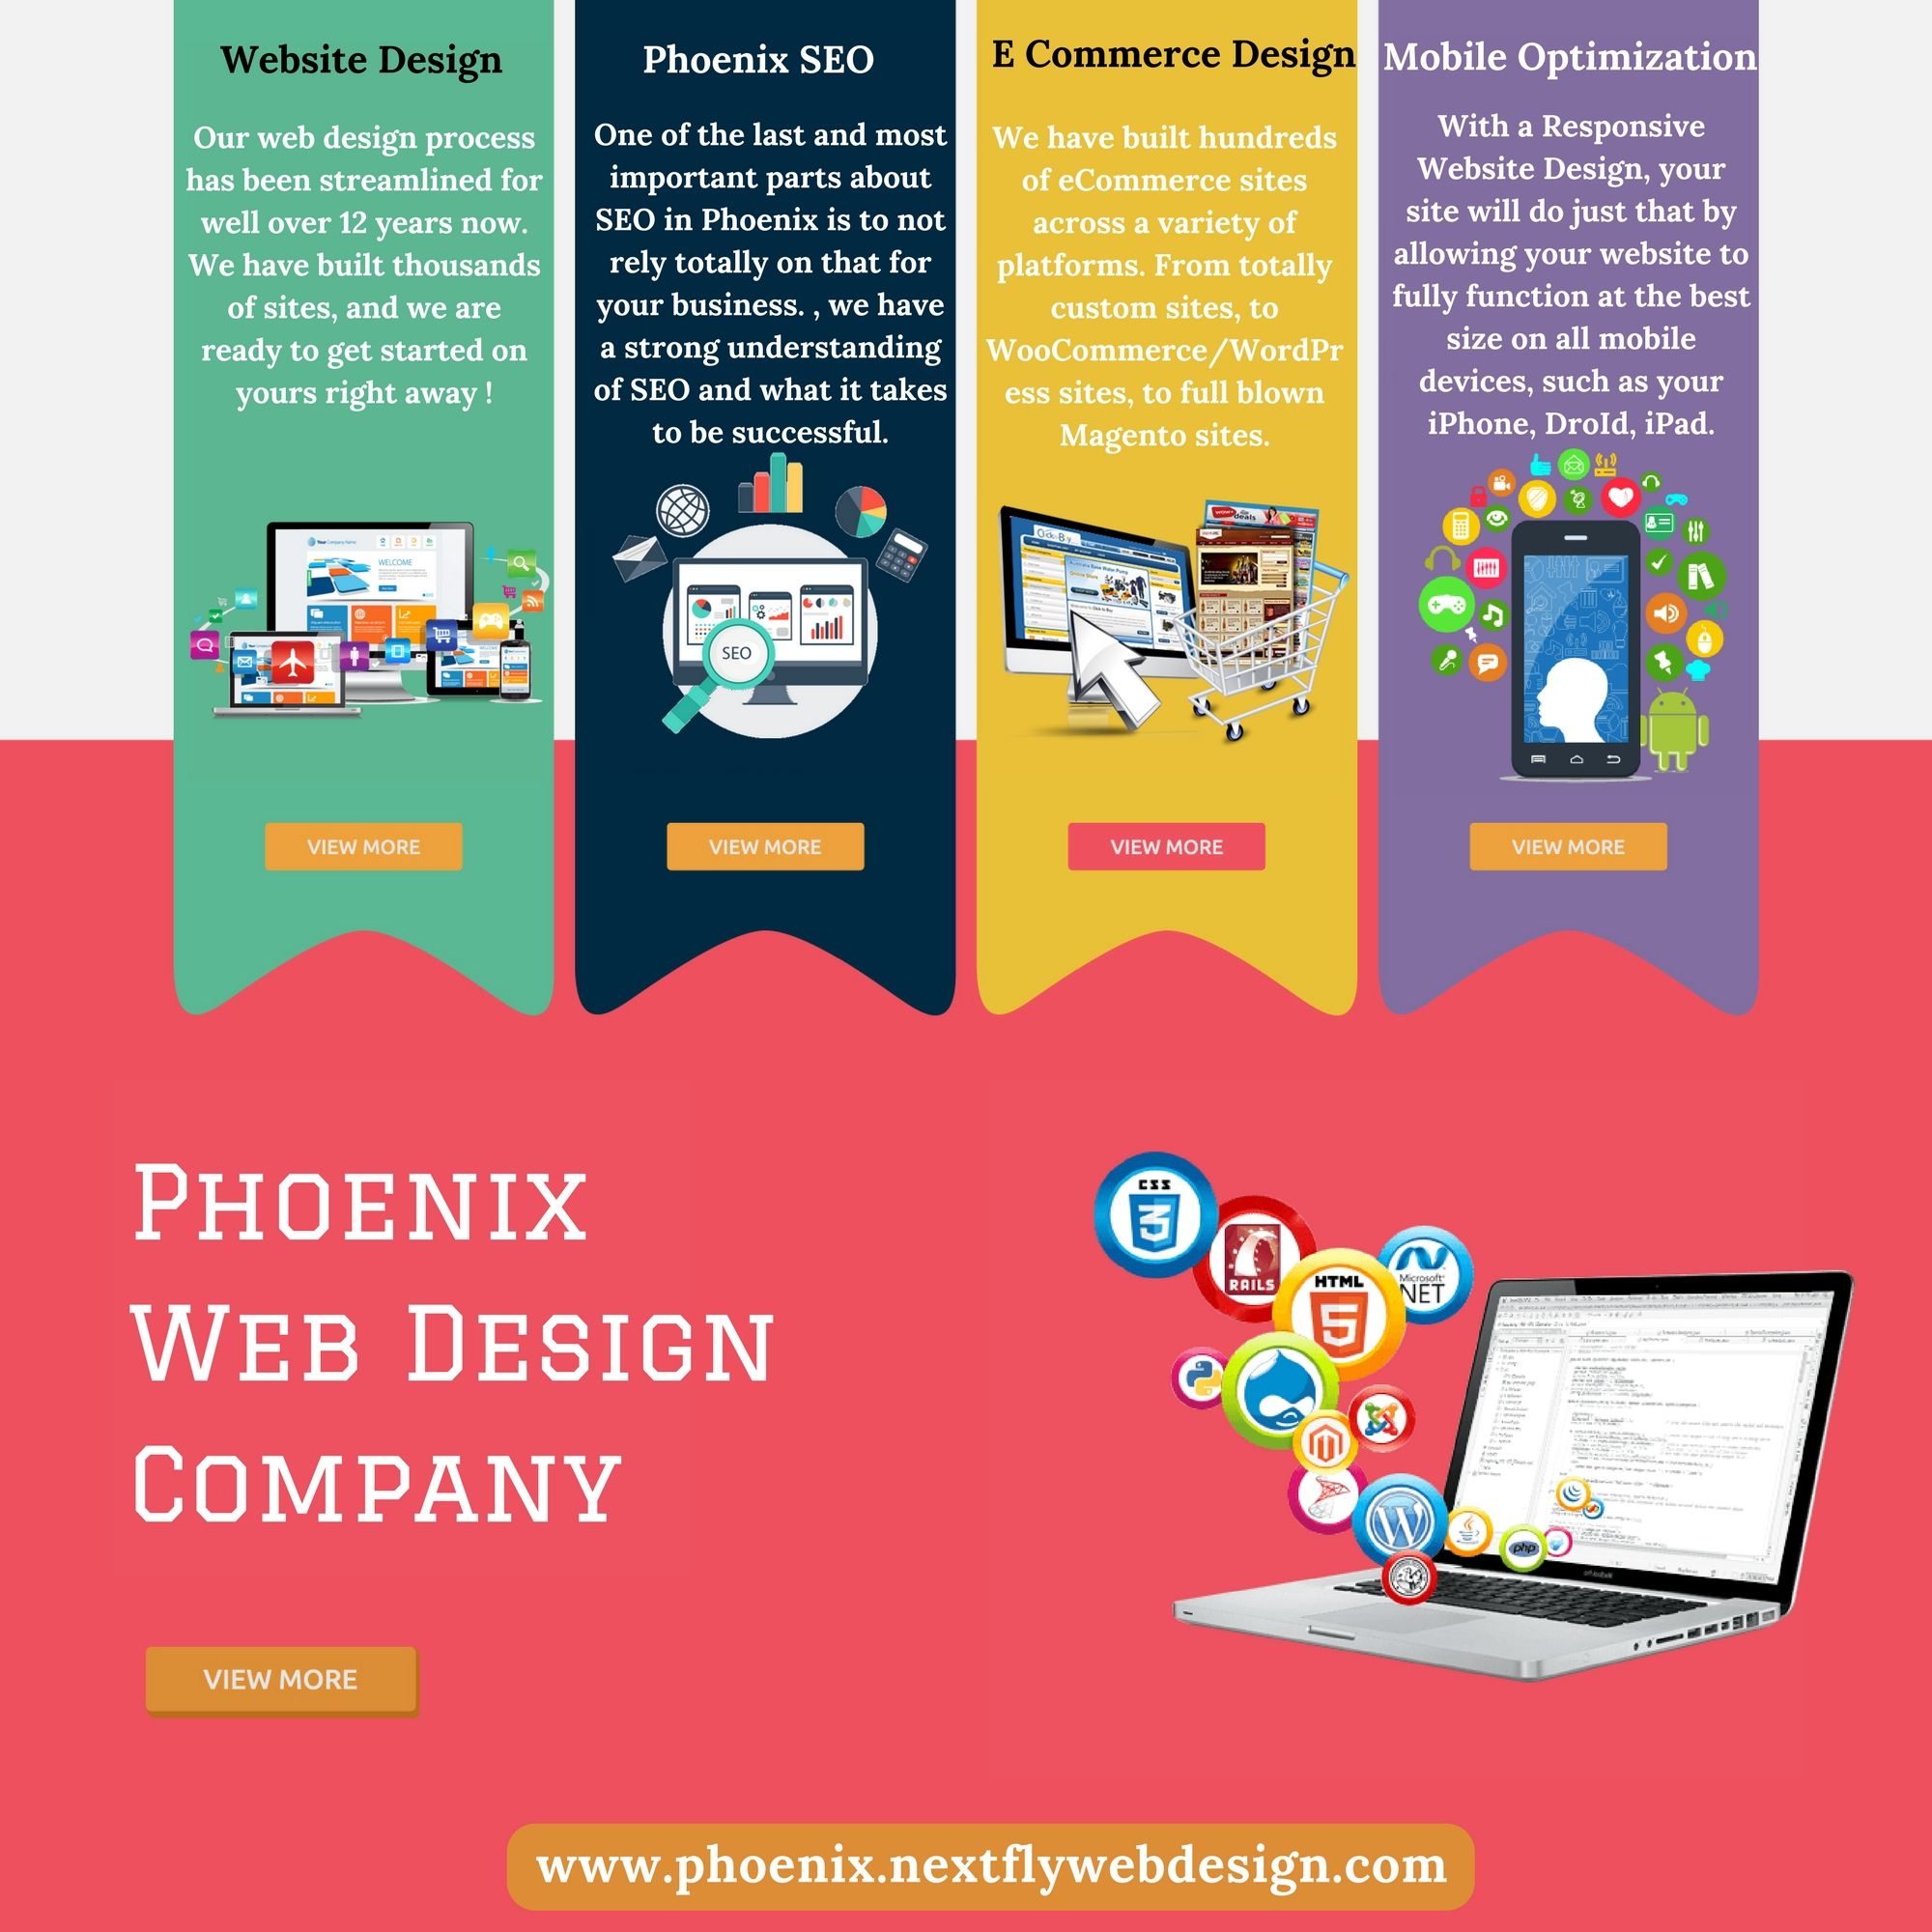 Nextfly Communications Is A Phoenix Web Design Company Situated In Phoenix Arizona The Provide Q Website Design Company Quality Web Design Web Design Company